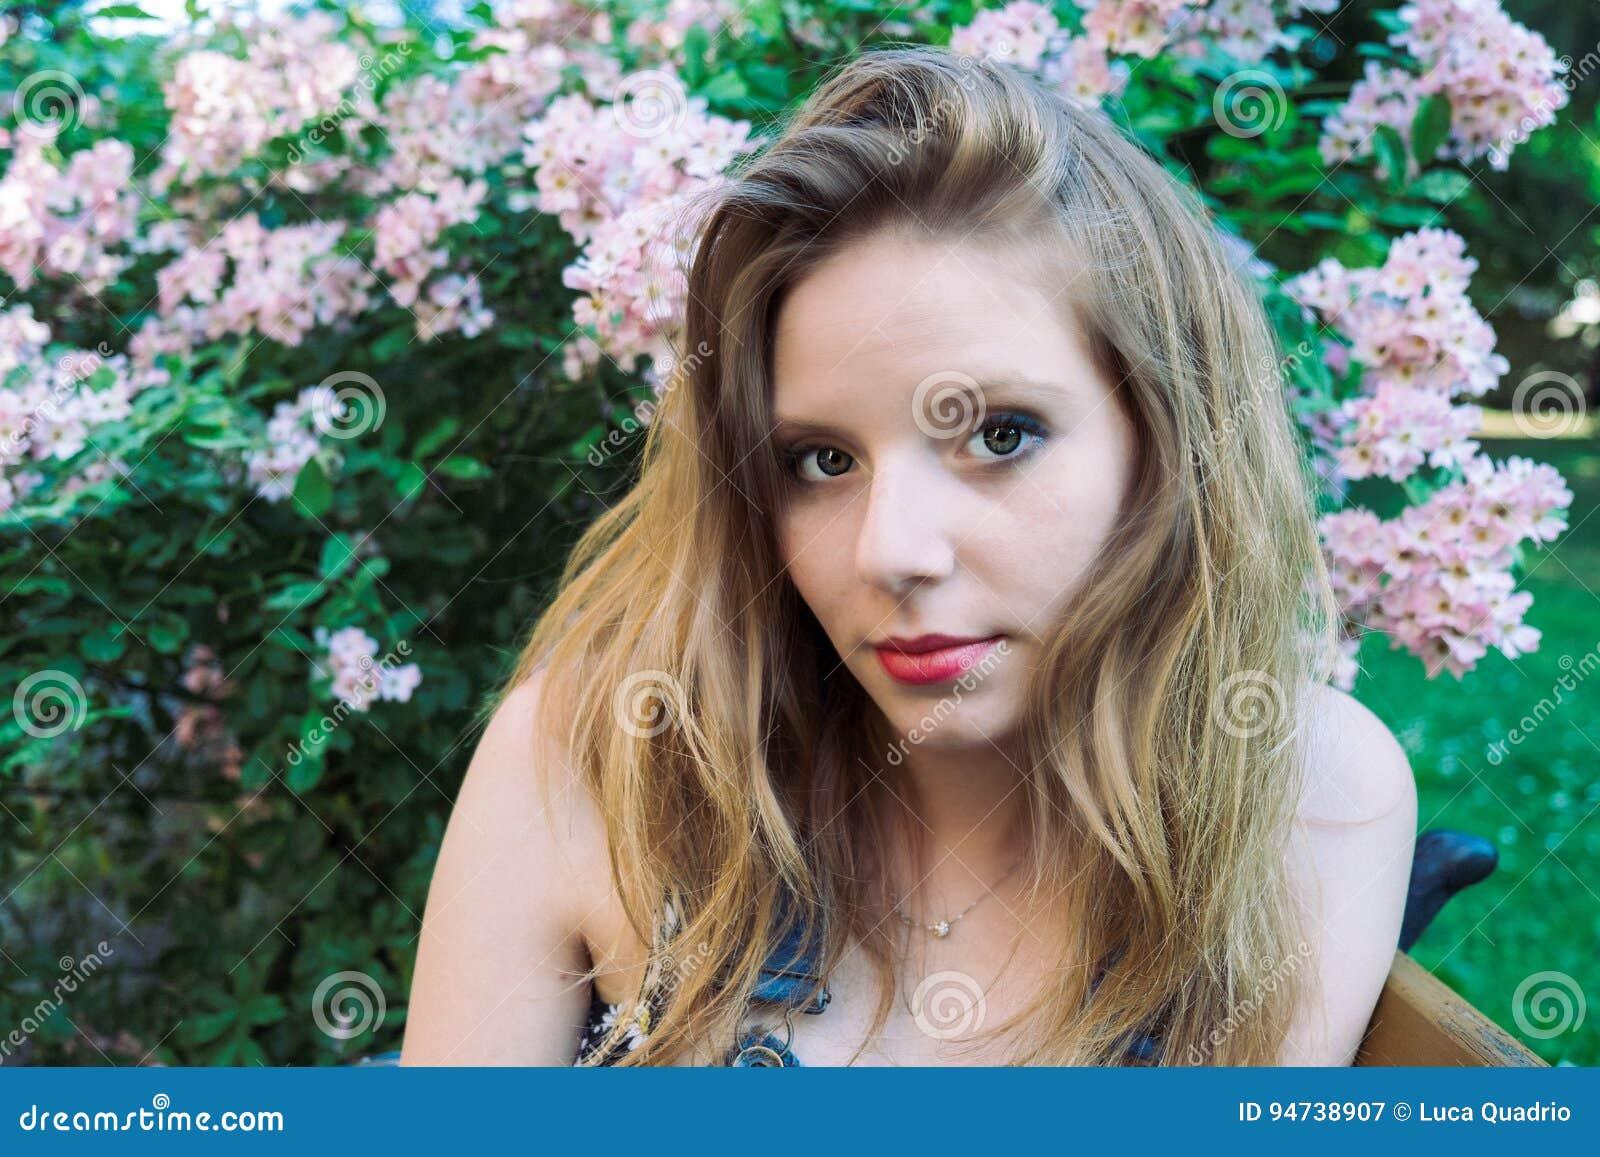 Summer portrait of a model